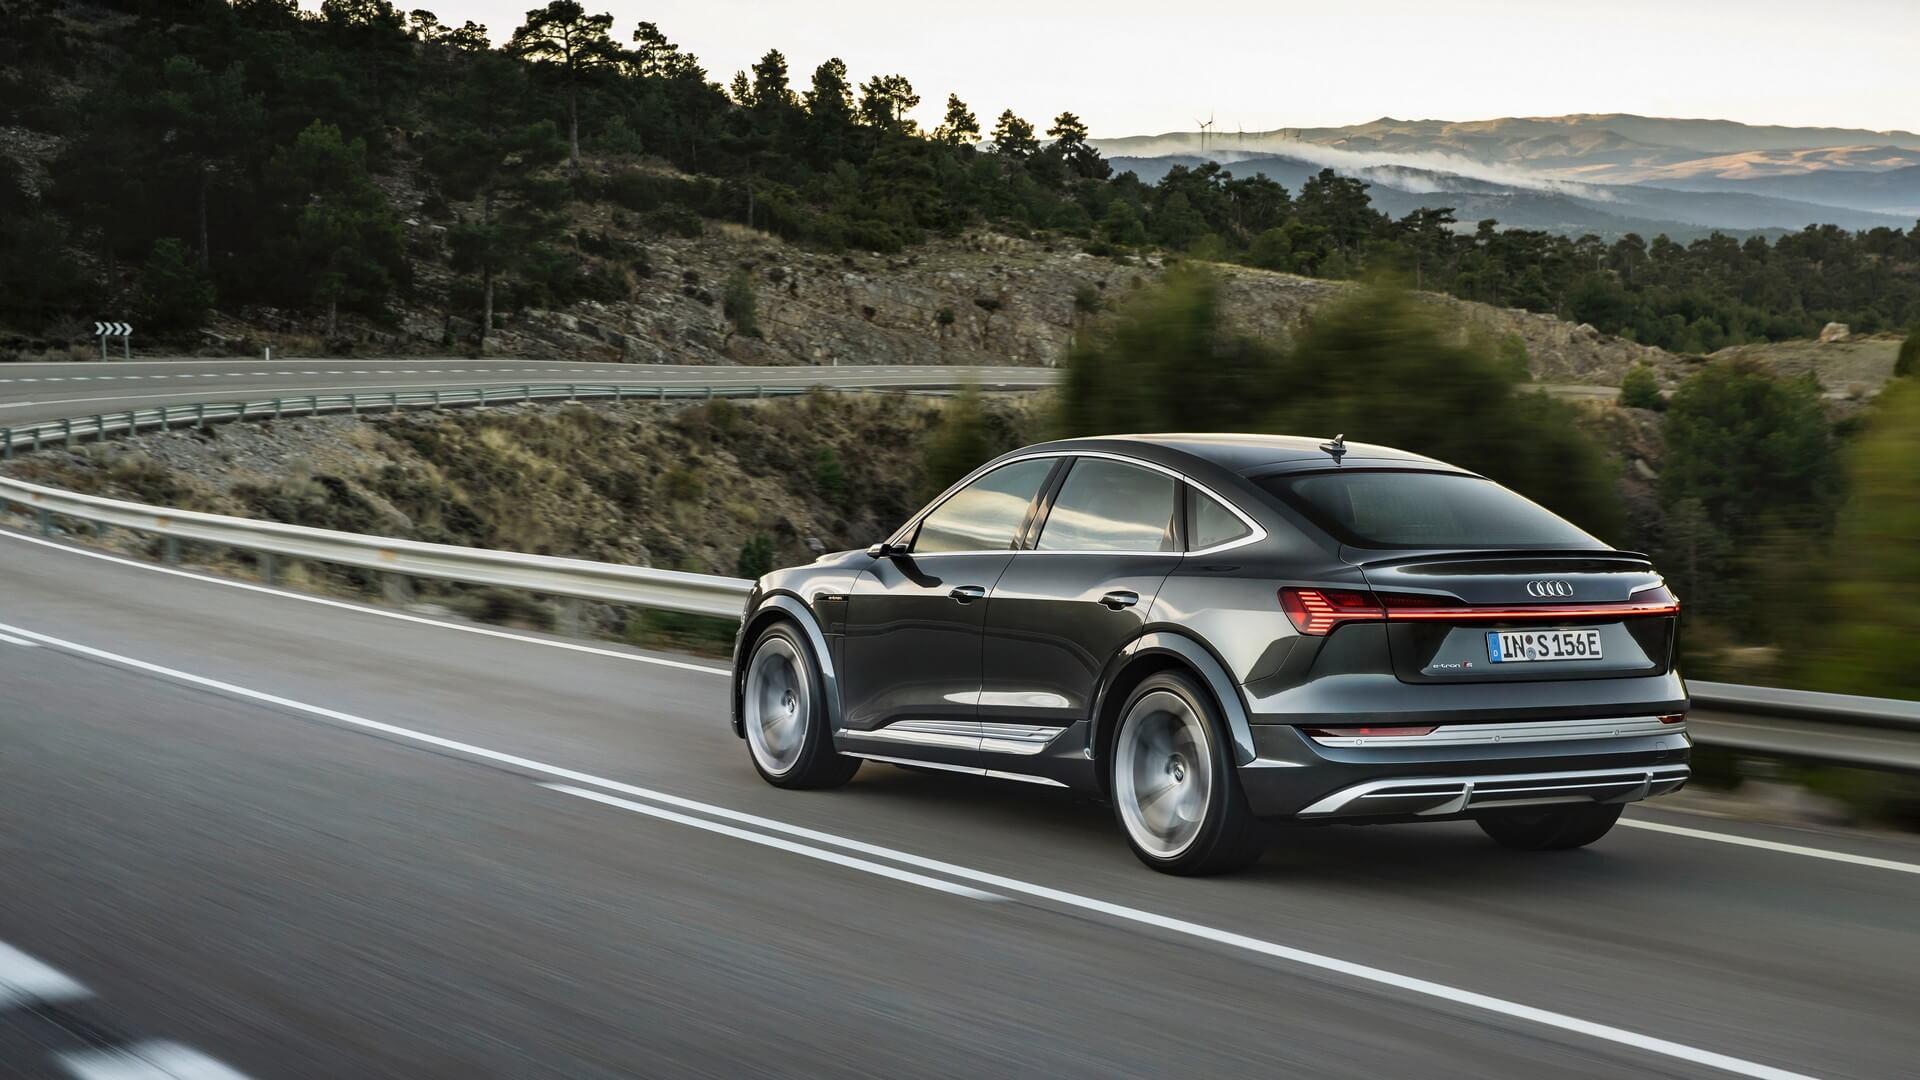 Audi-E-Tron-S-and-E-Tron-S-Sportback-2020-52